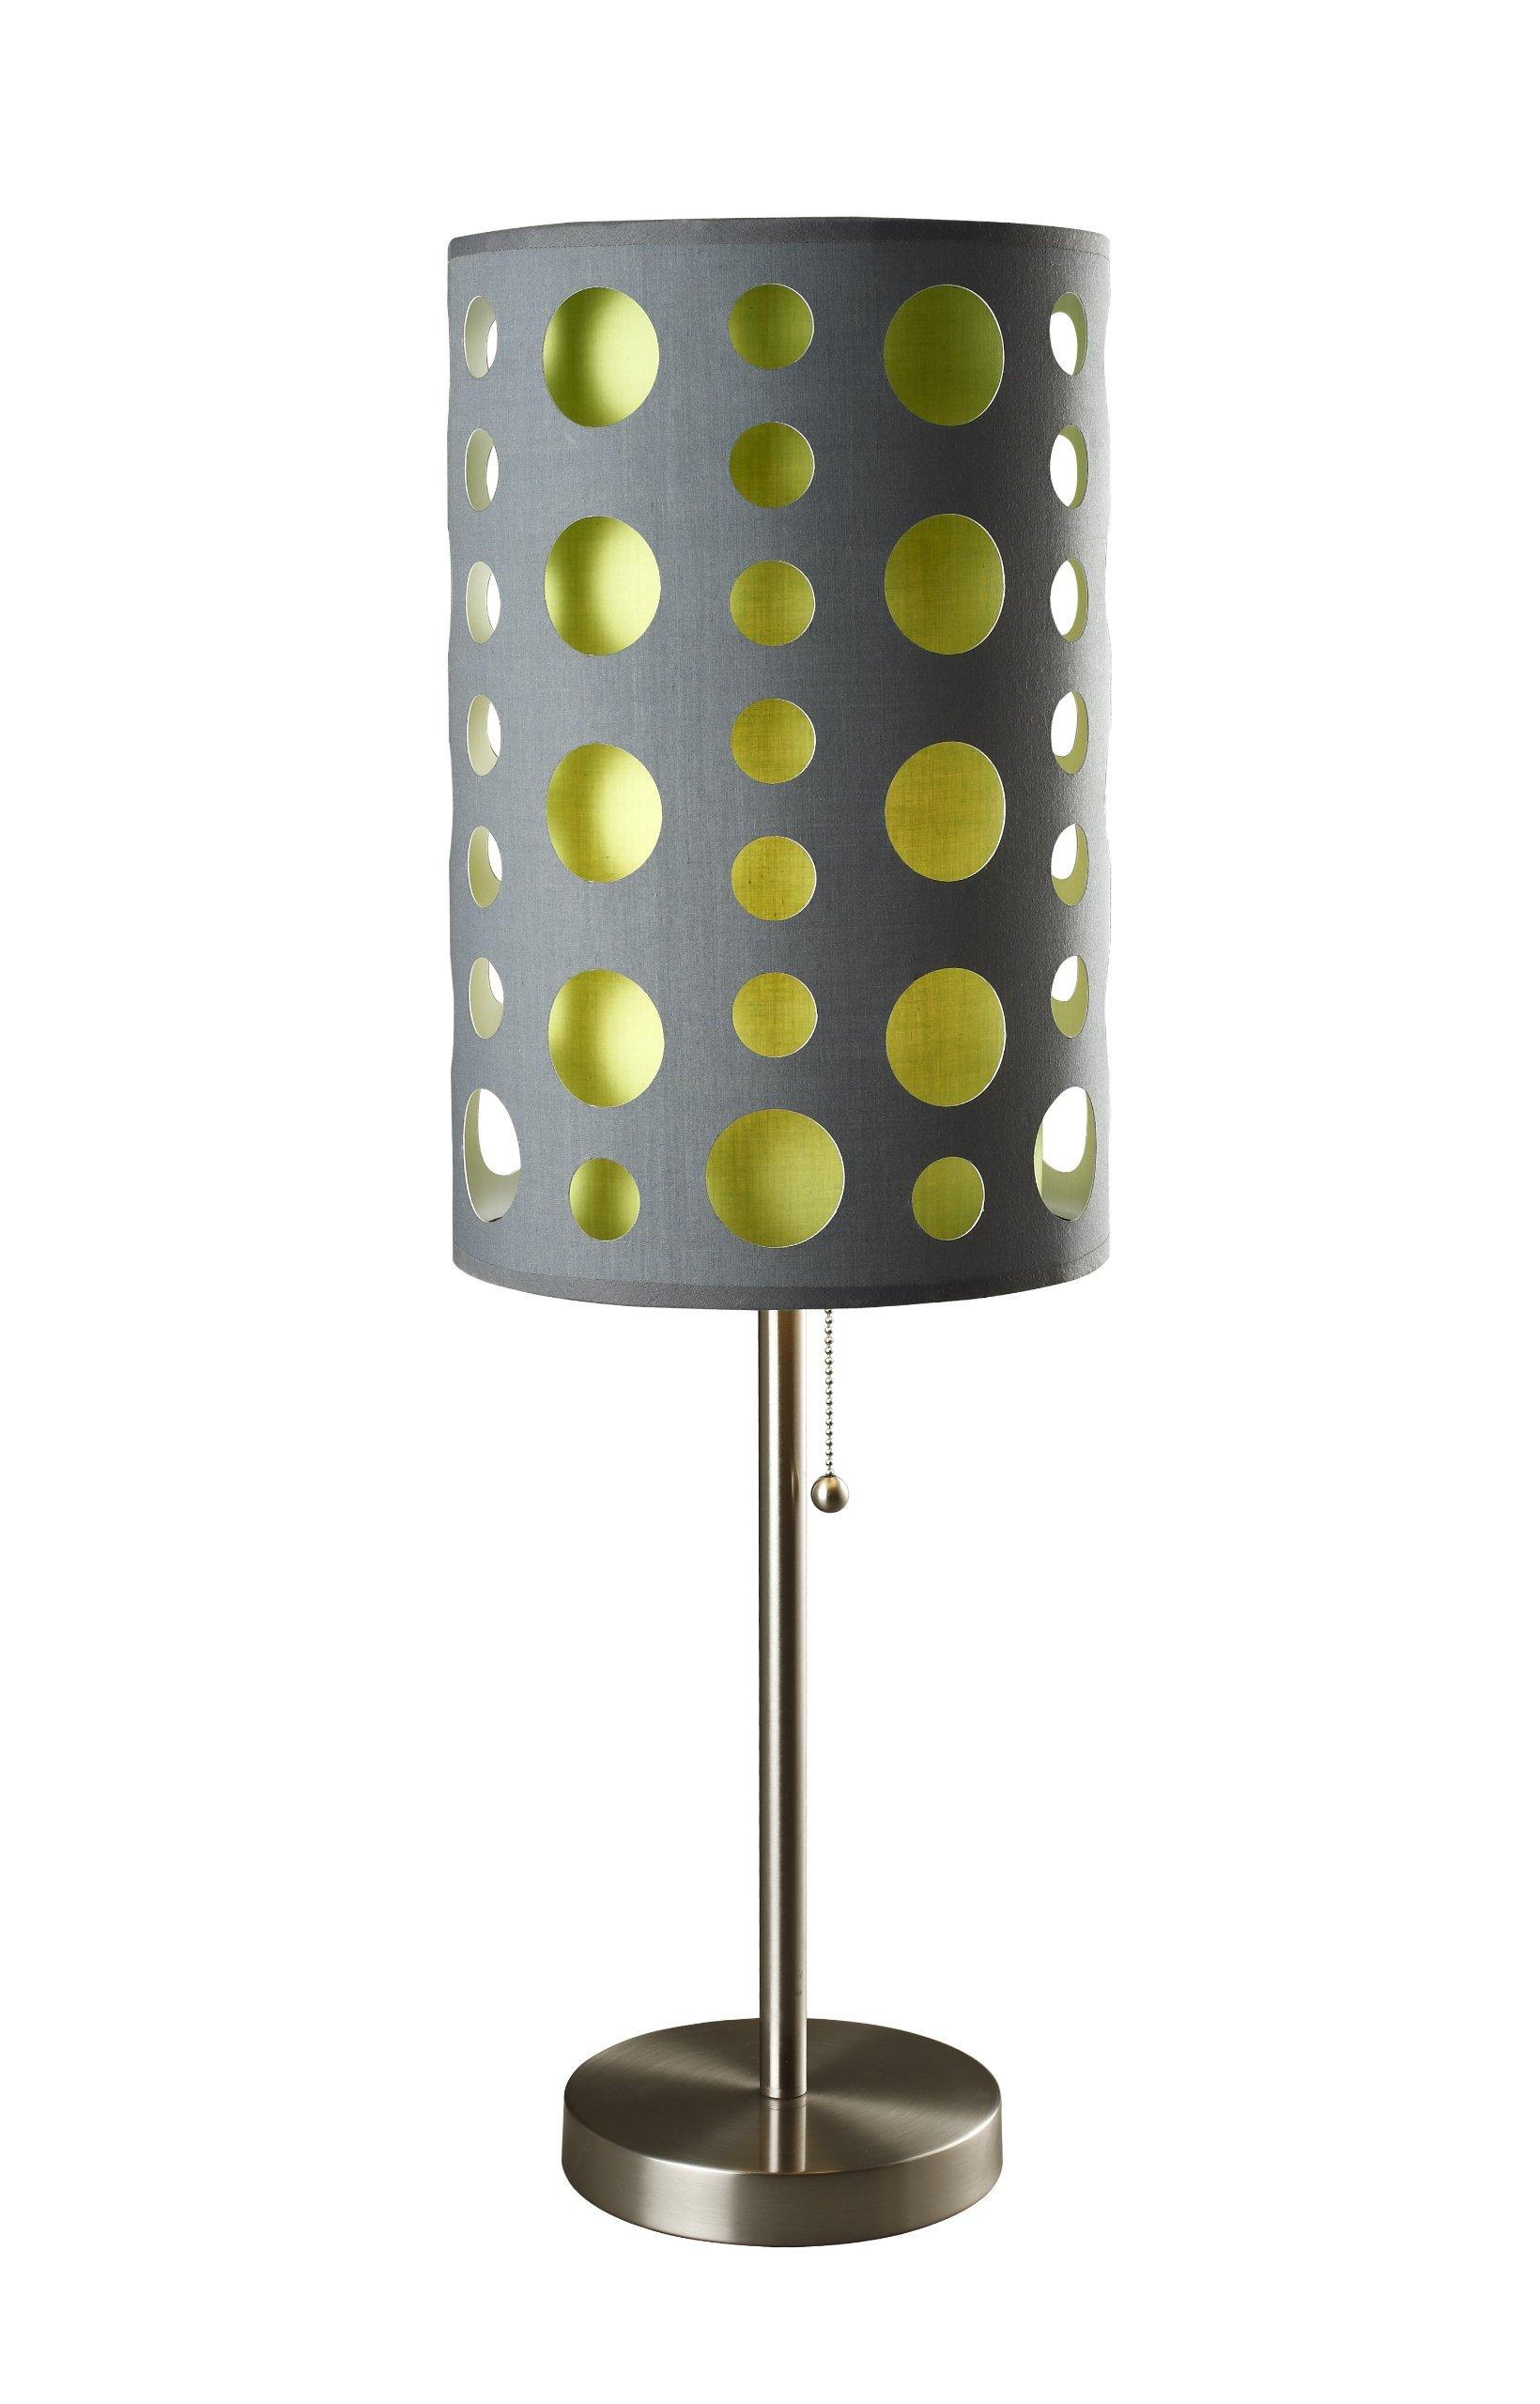 Ore International 9300T-GY-GN Modern Retro Table Lamp, 33-Inch, Grey/Green